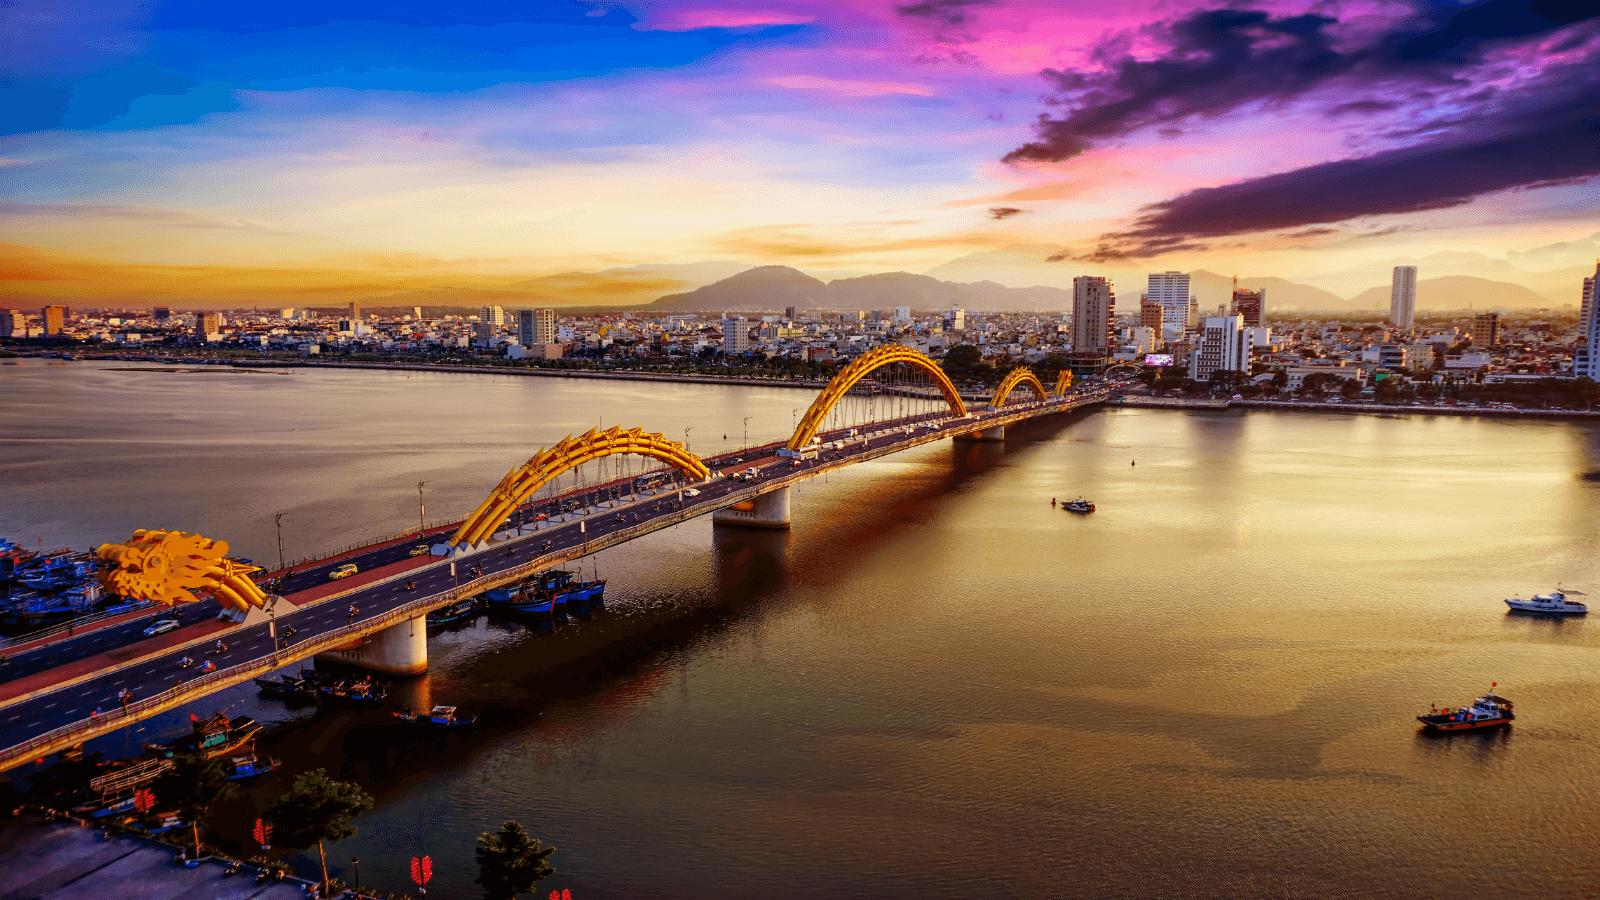 Danang is known as a city of bridge. Photo: bestpricetravel